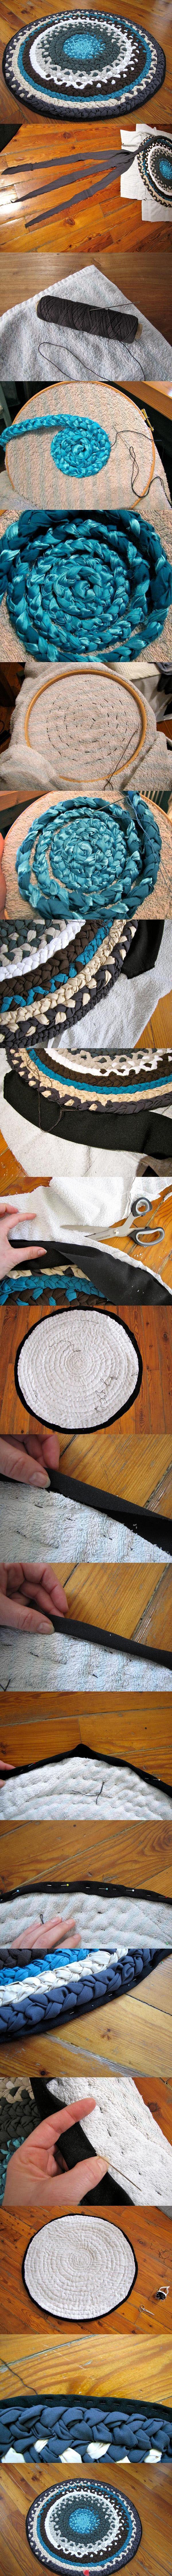 linda alfombra para reutilizar viejas prendasss!